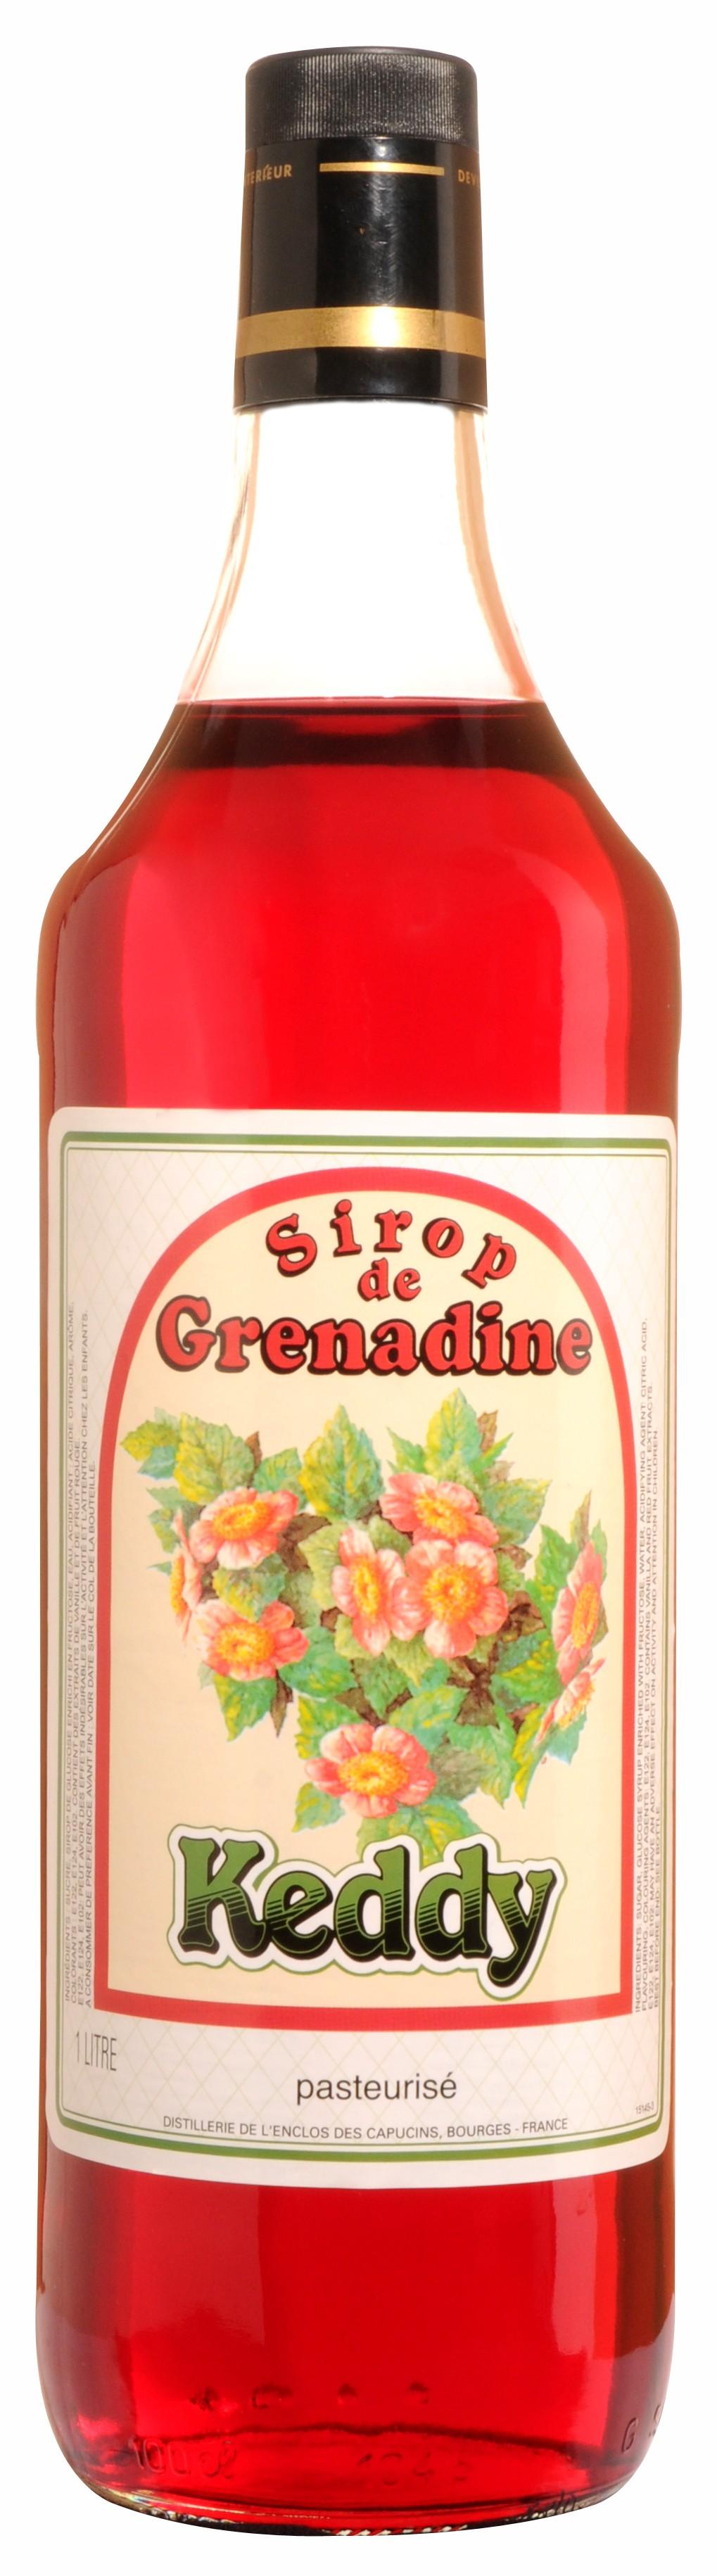 Sirop de grenadine, citron, fraise..